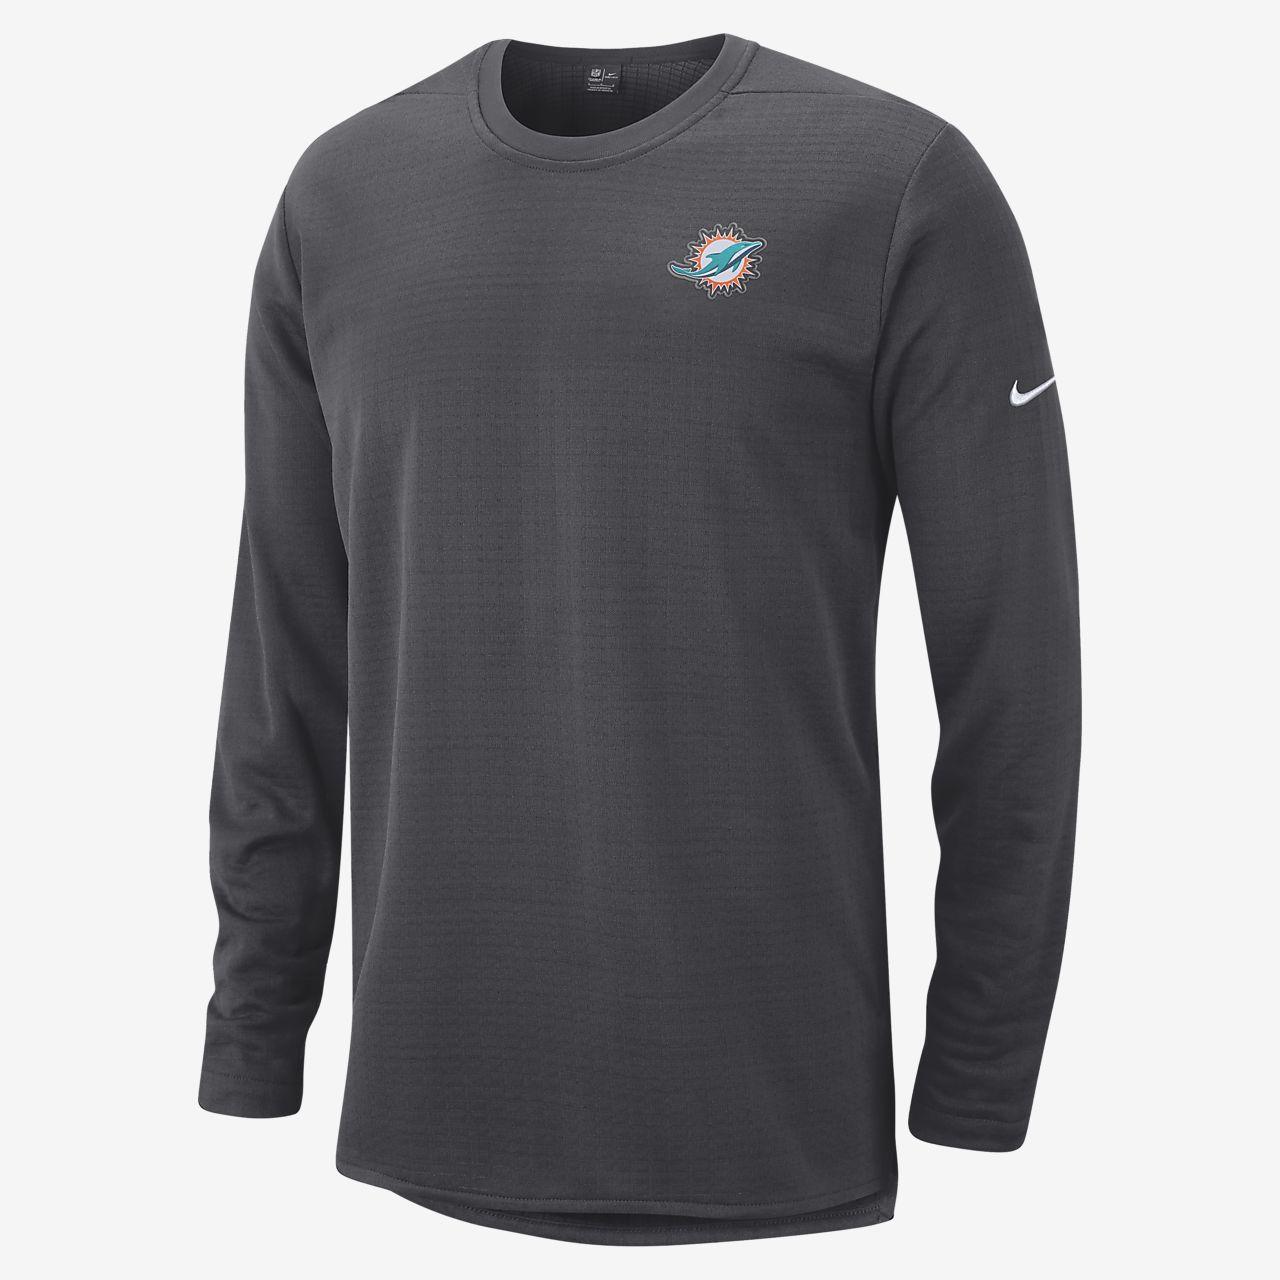 4fdf6864 Nike Modern (NFL Dolphins) Men's Long Sleeve Top. Nike.com